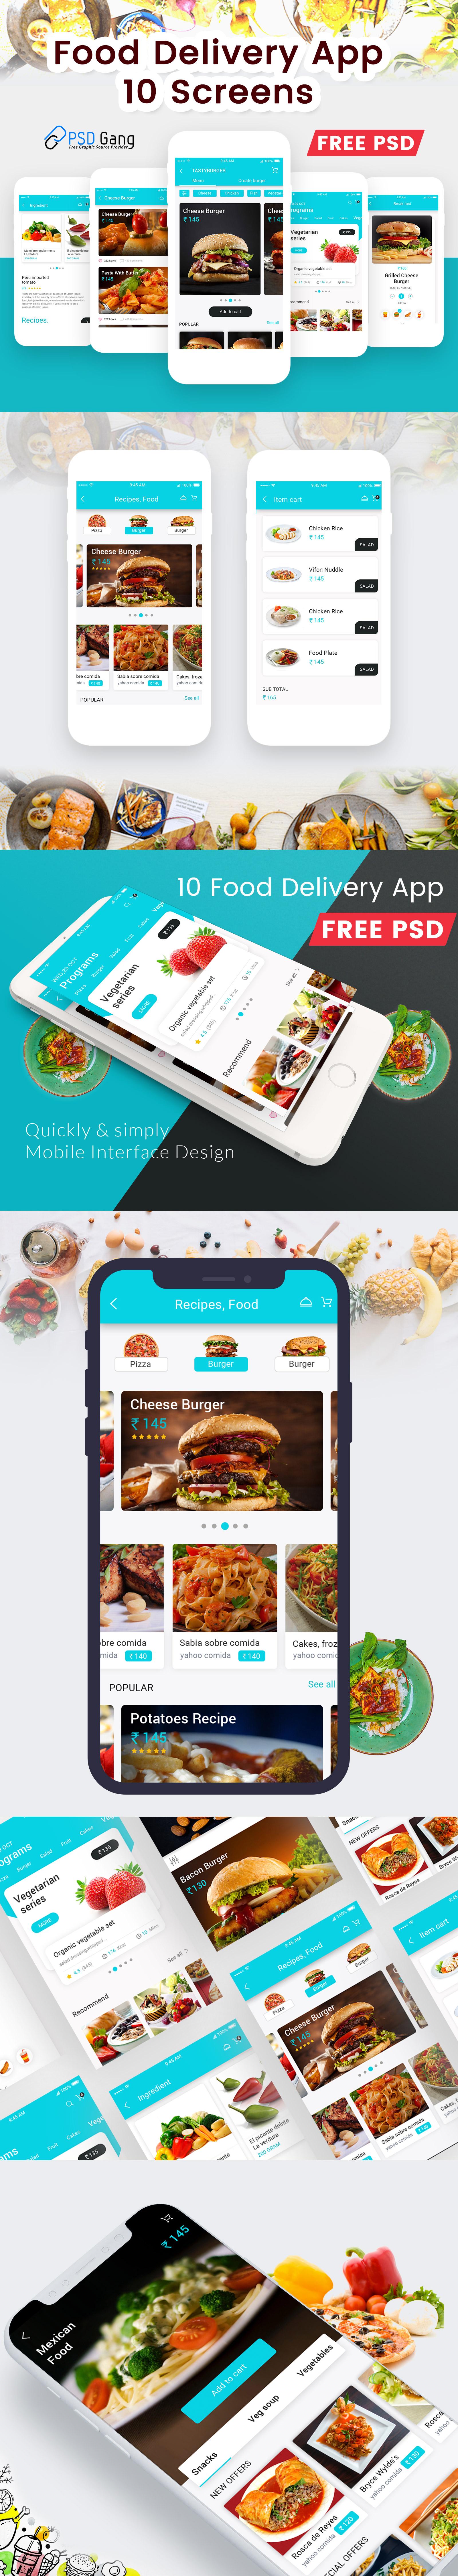 Food-app-design01